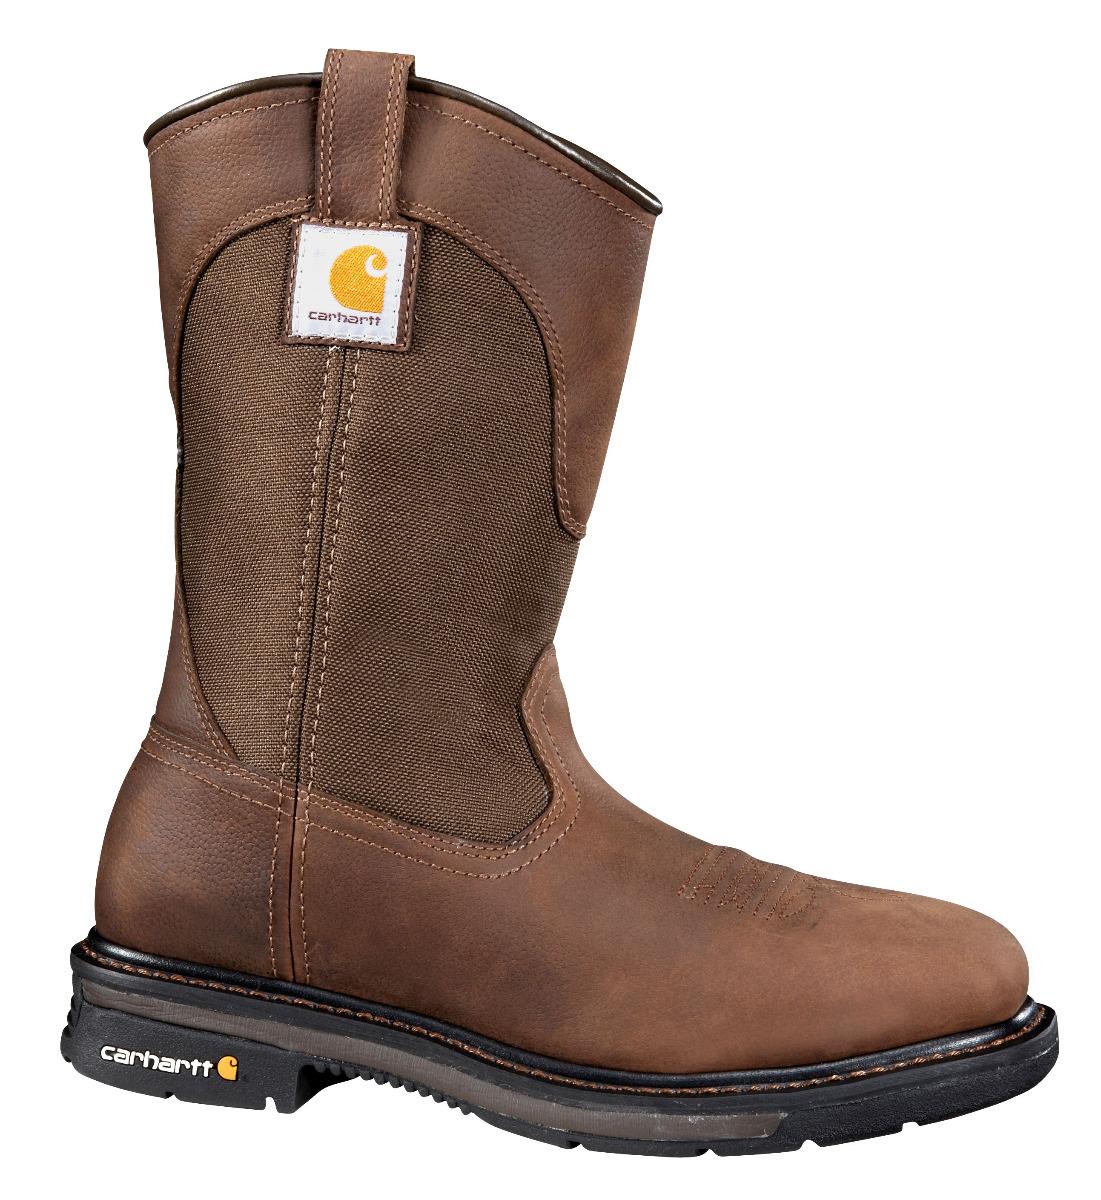 Carhartt 11-Inch Square Steel Toe Wellington Boot